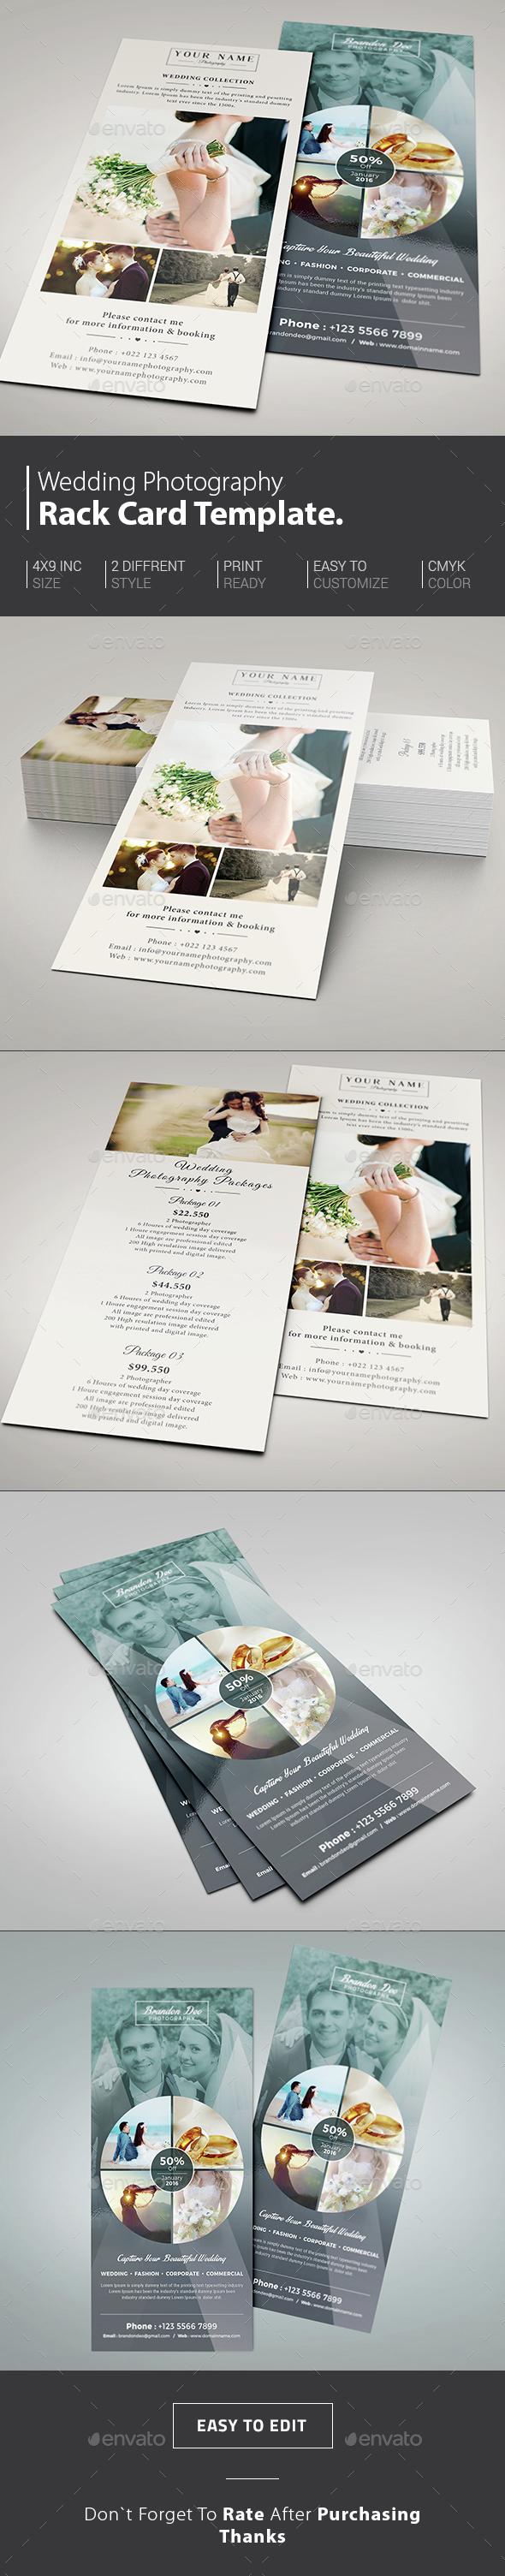 Wedding Photography Rack Card - Corporate Flyers